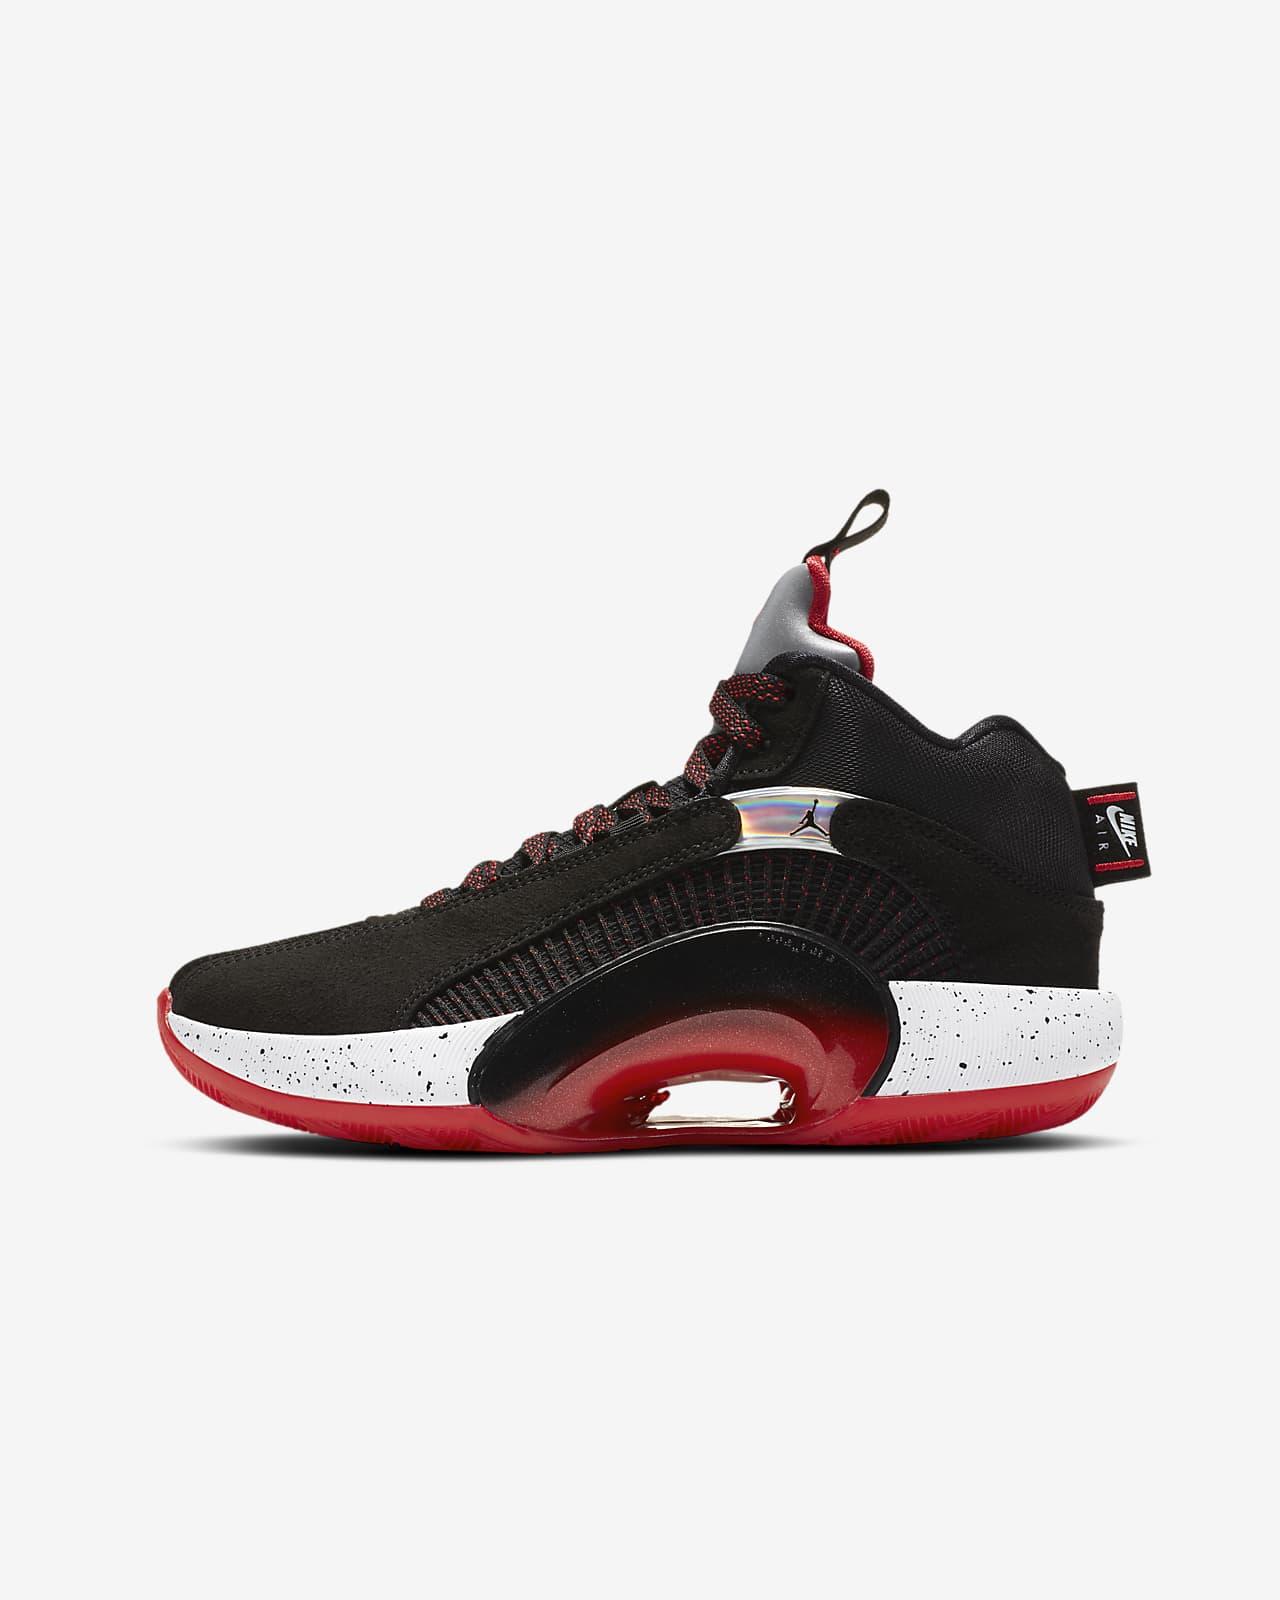 Air Jordan XXXV Older Kids' Basketball Shoe